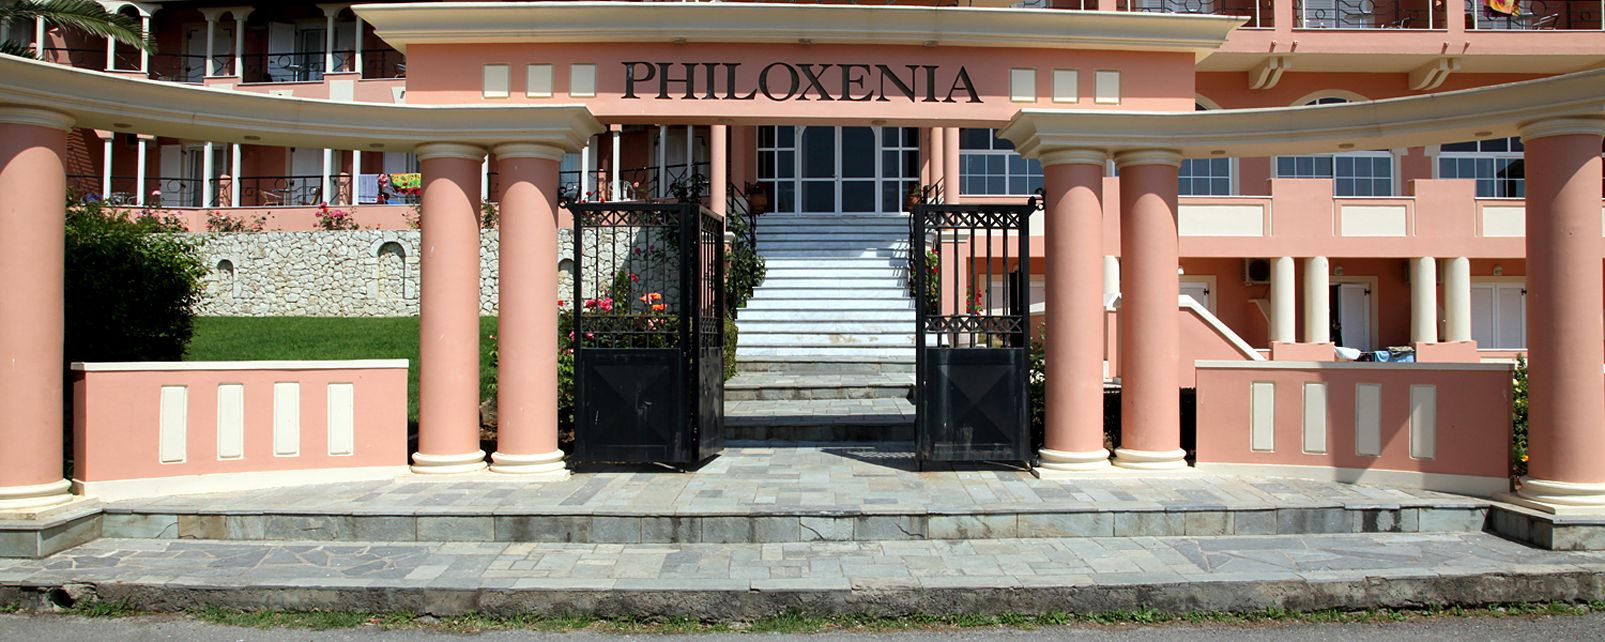 Hotel Philoxenia Corfou